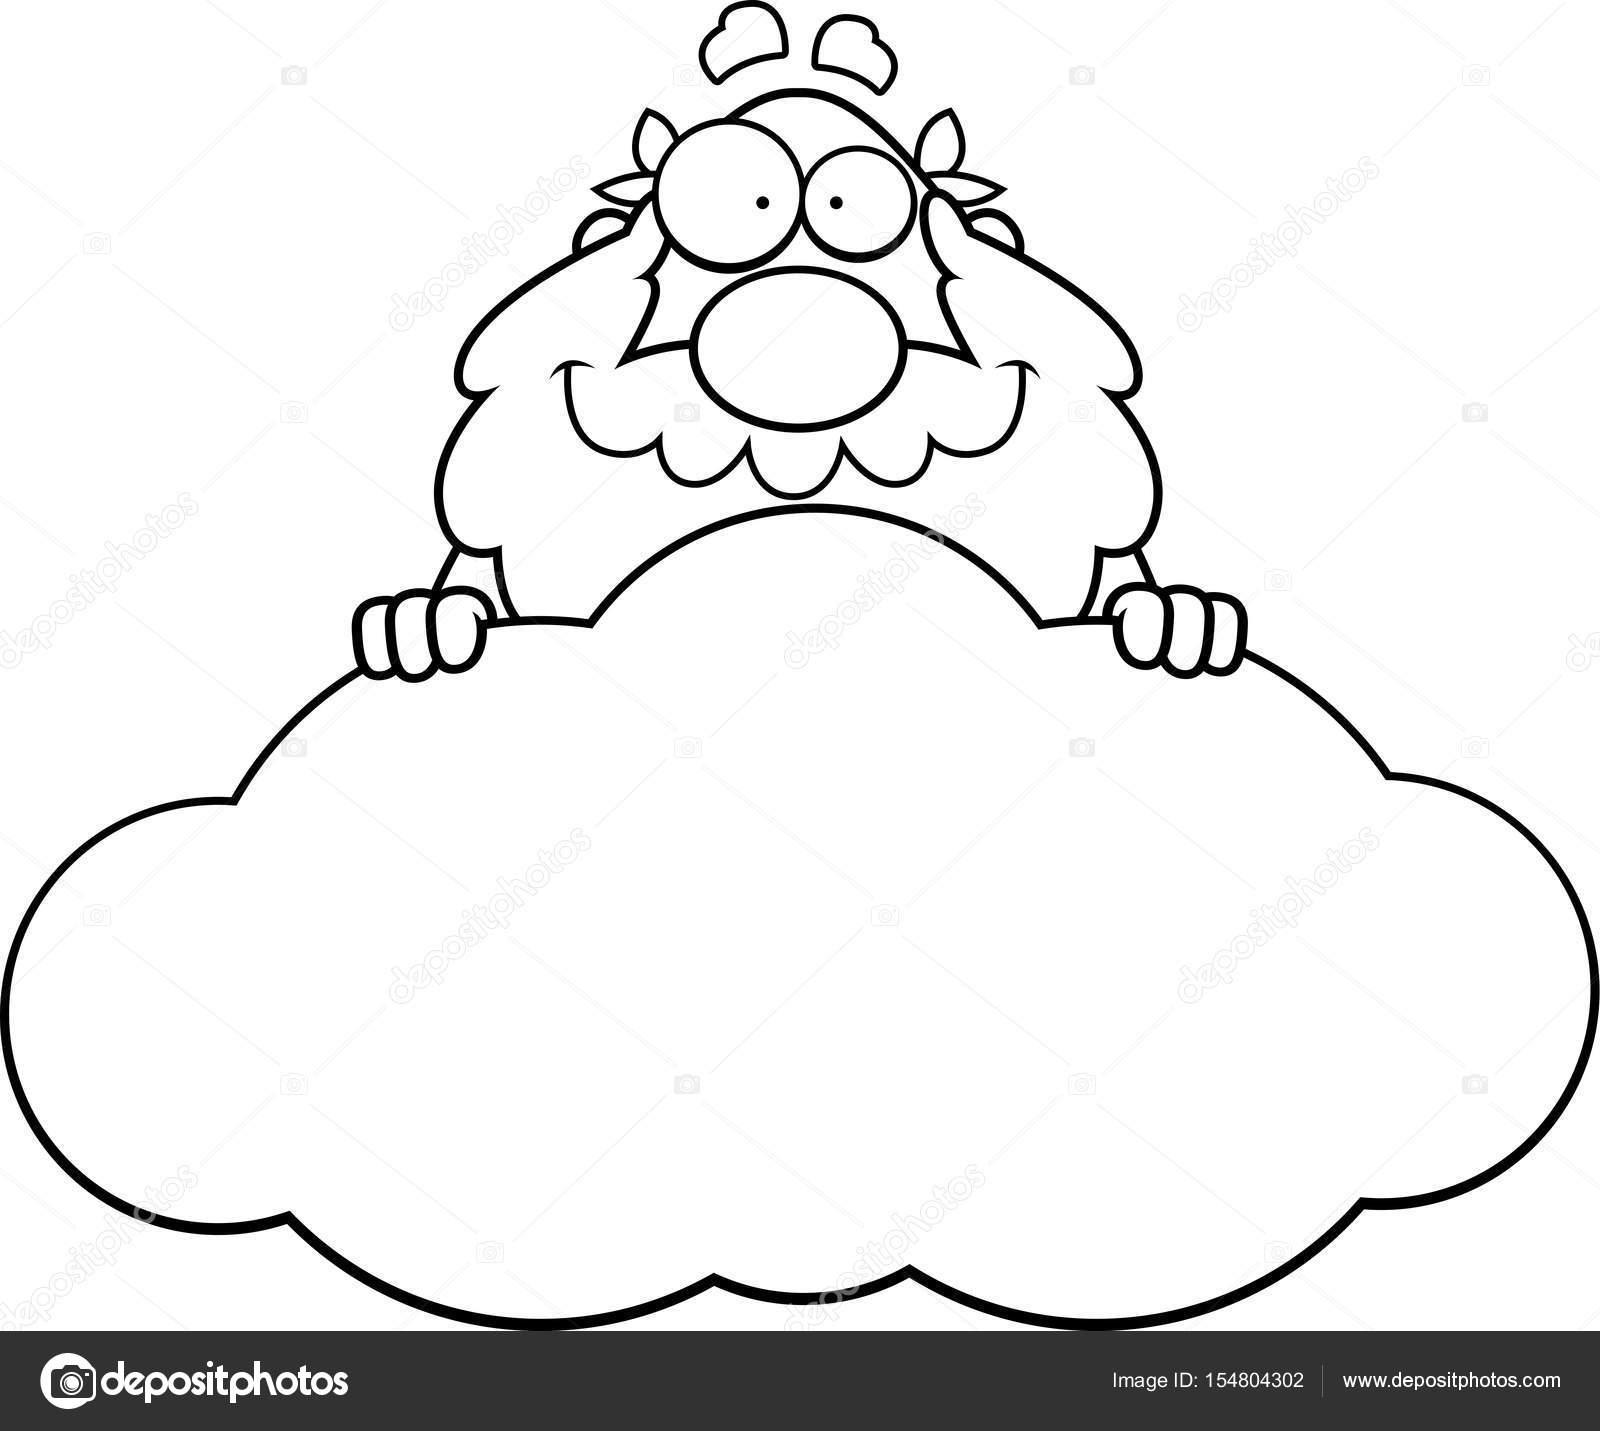 1600x1431 Cartoon God Cloud Stock Vector Cthoman